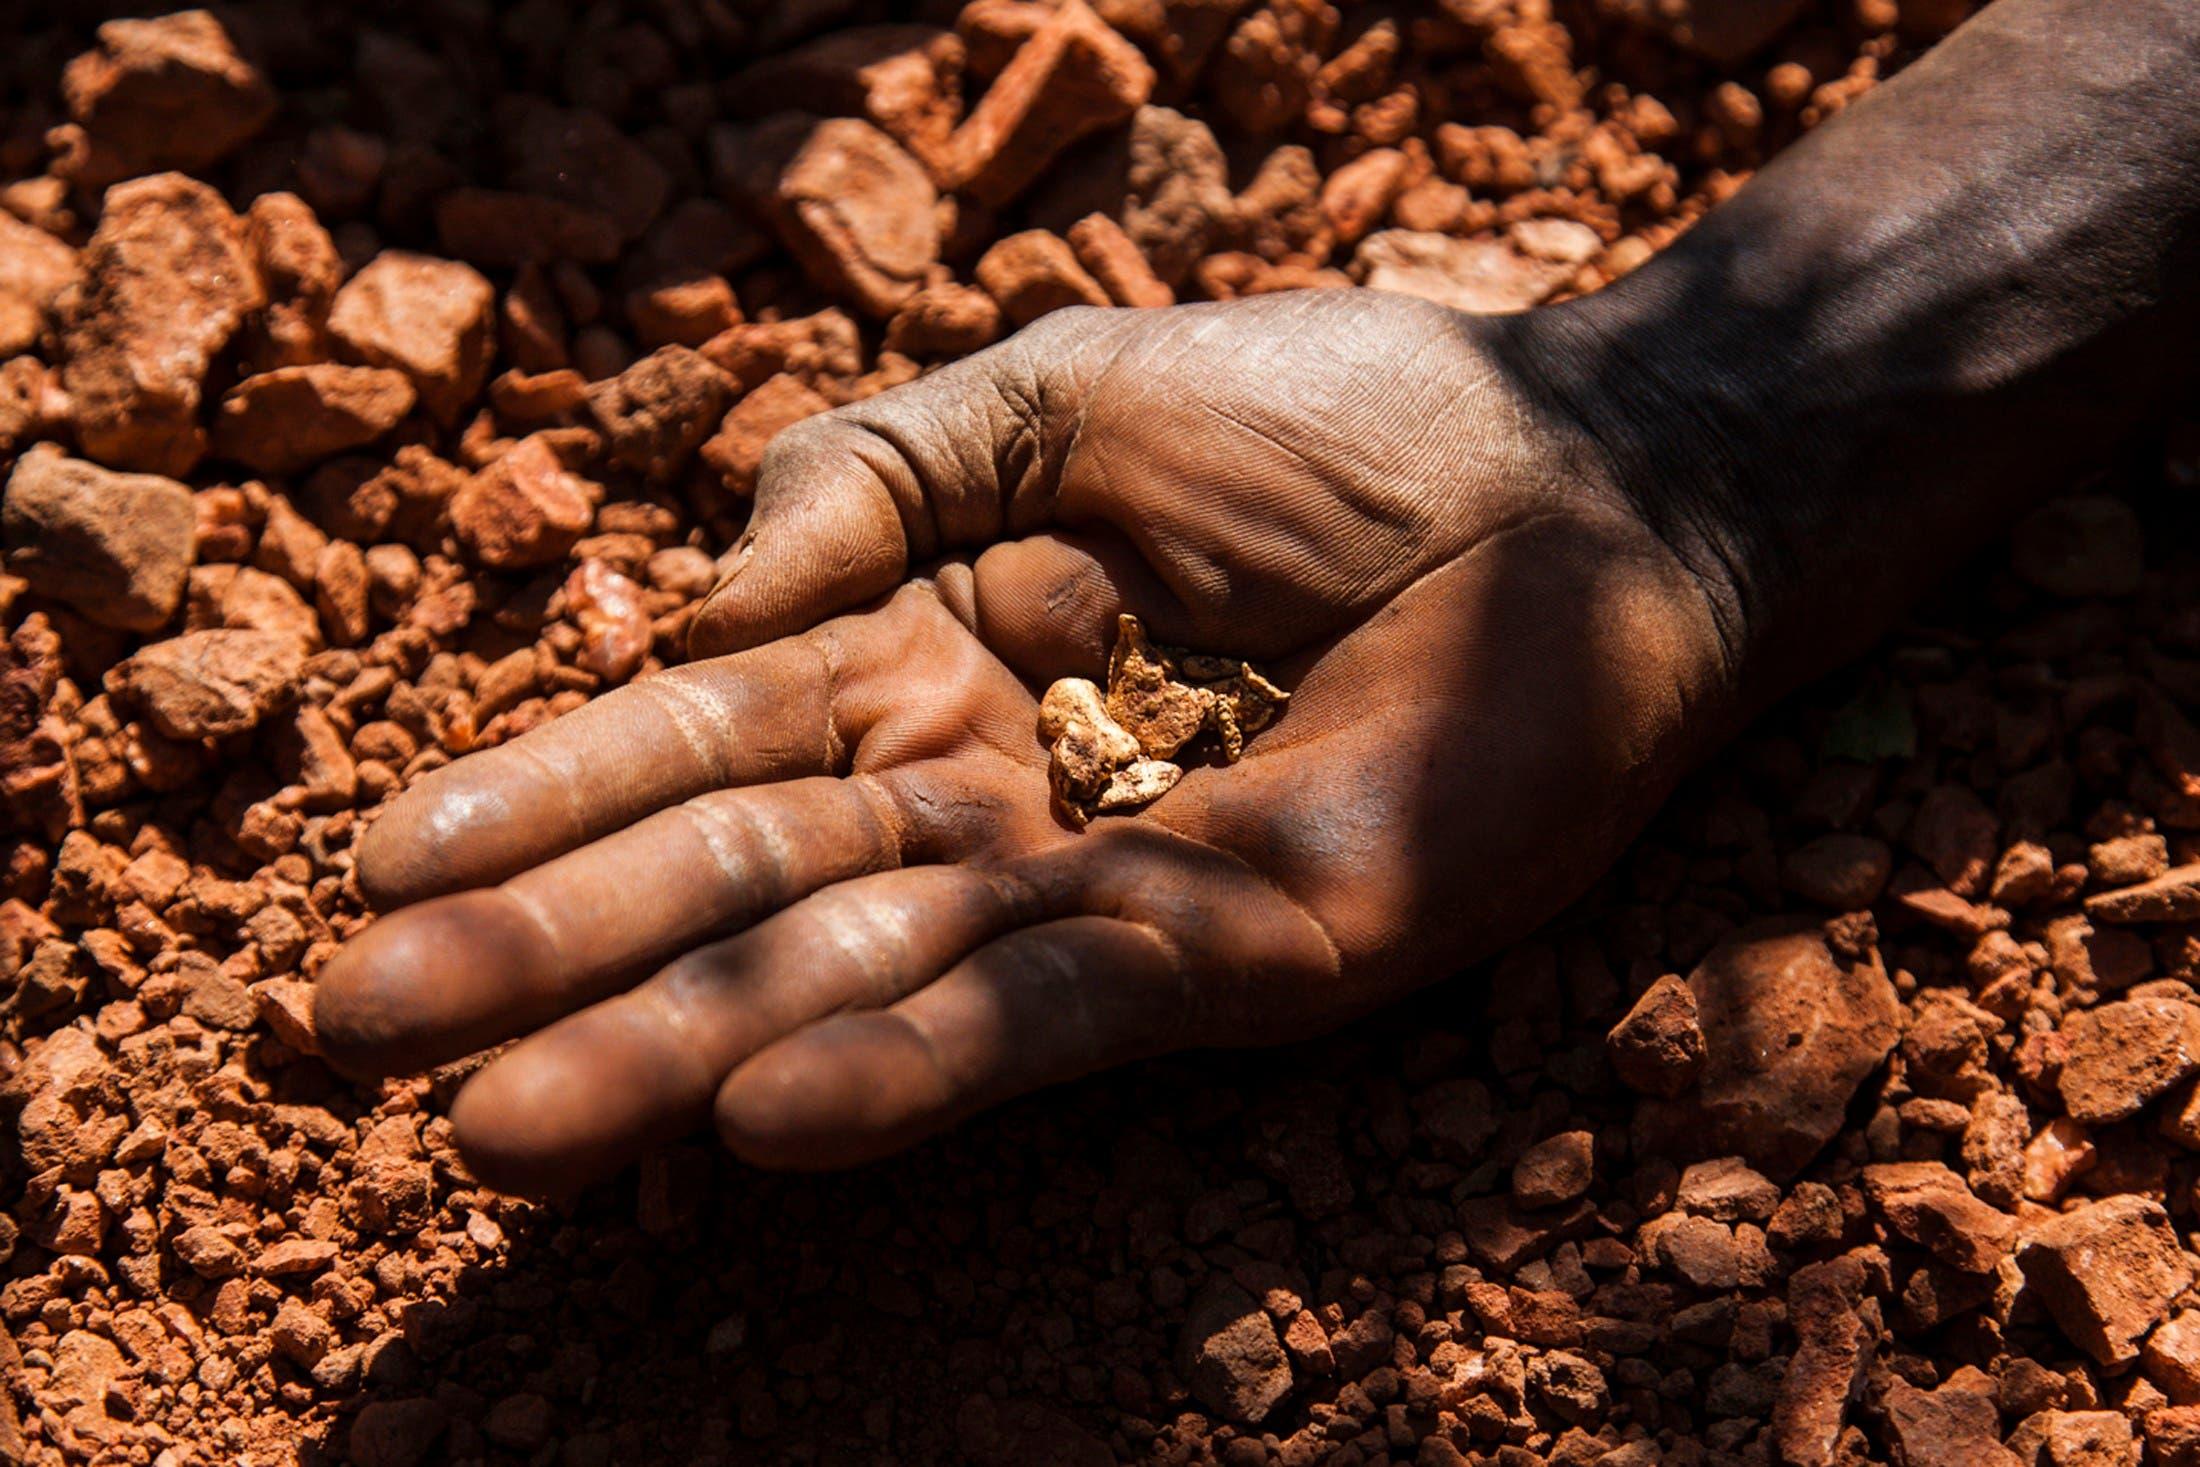 Gold mining in Sudan